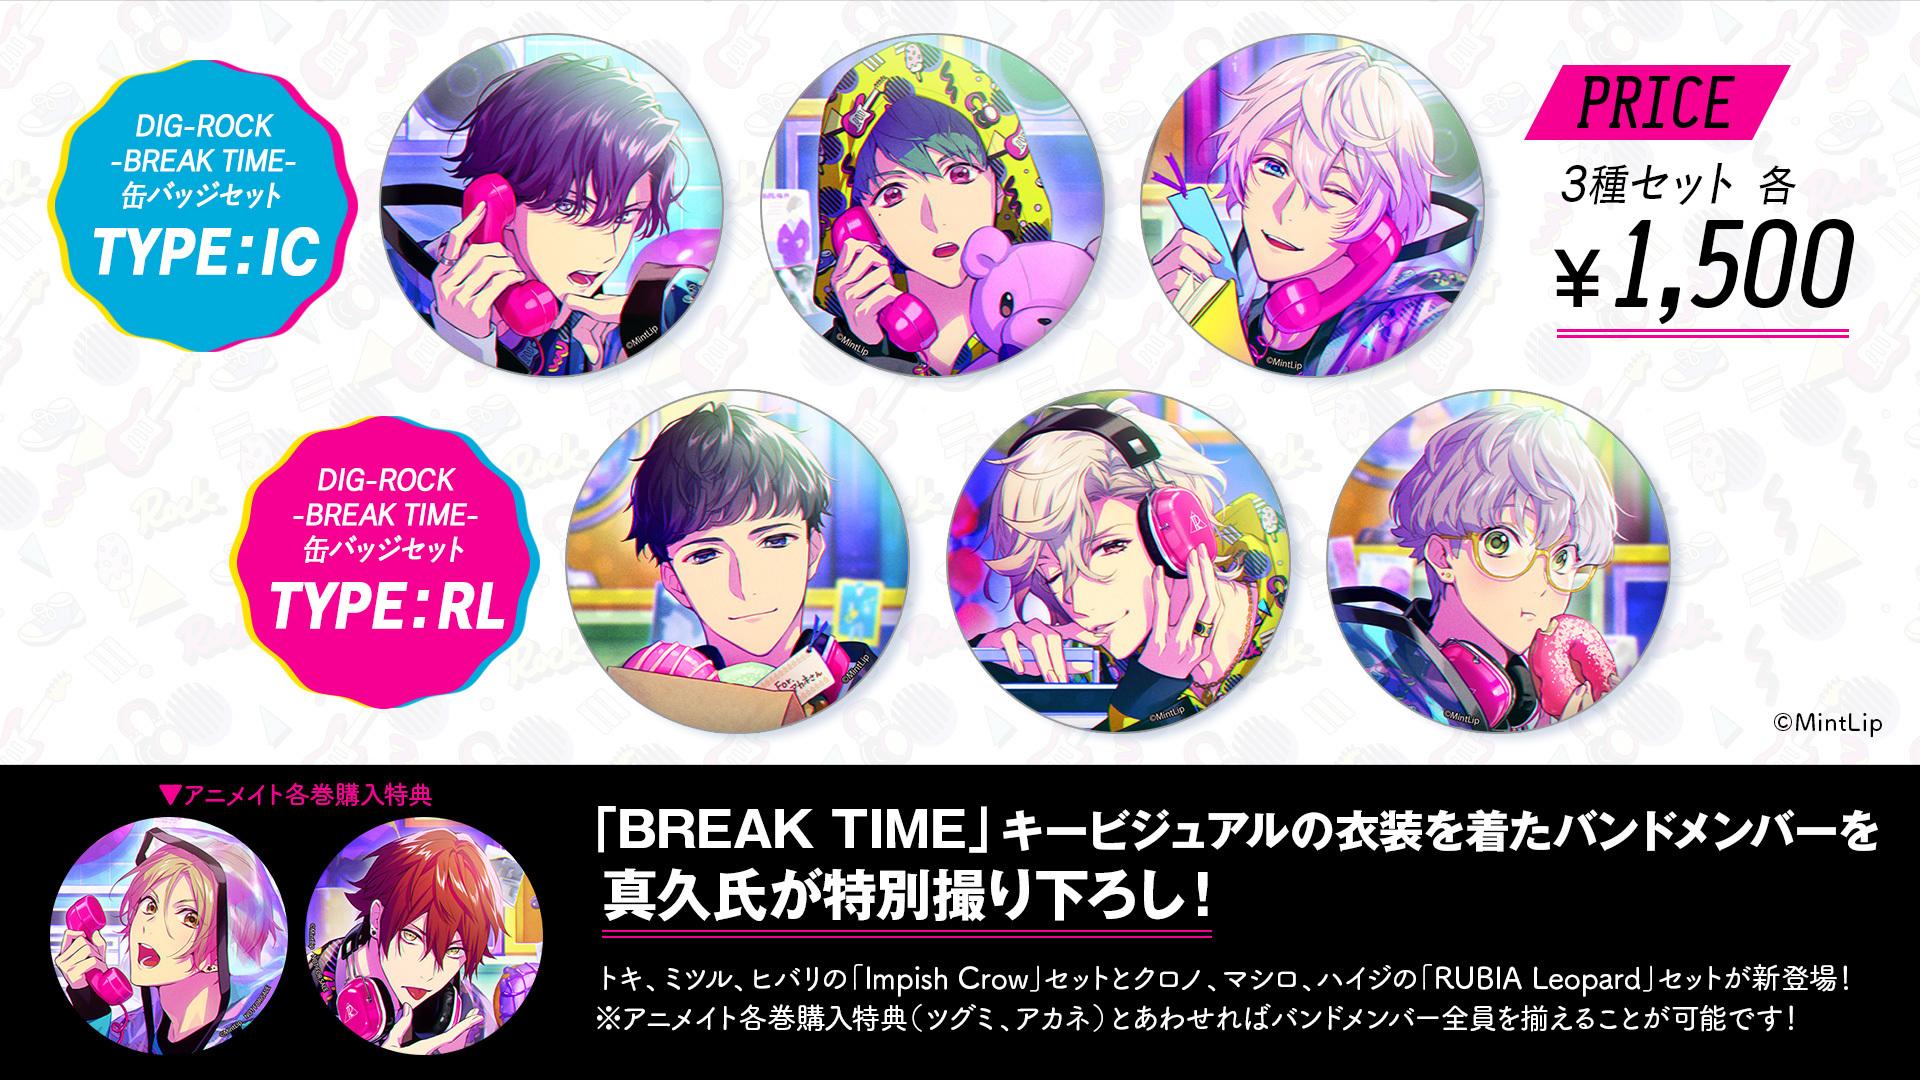 DIG-ROCK BREAK TIME 缶バッジセット Type:RL